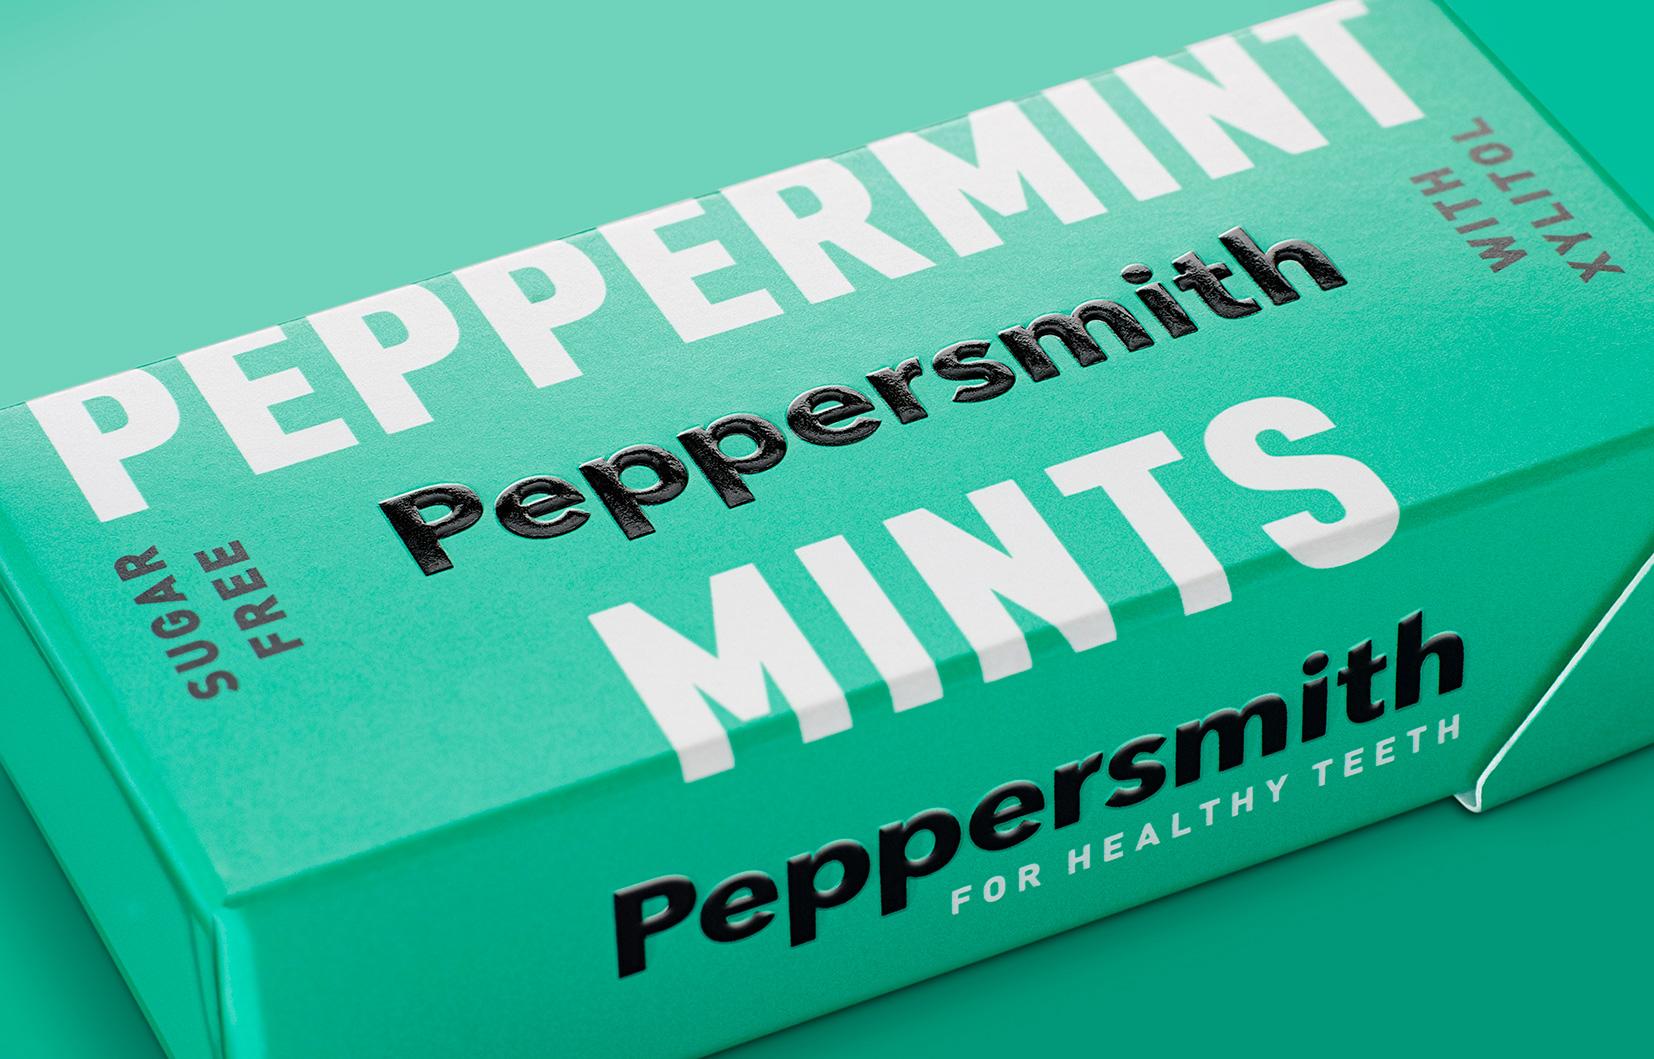 peppersmith_hero_03.jpg